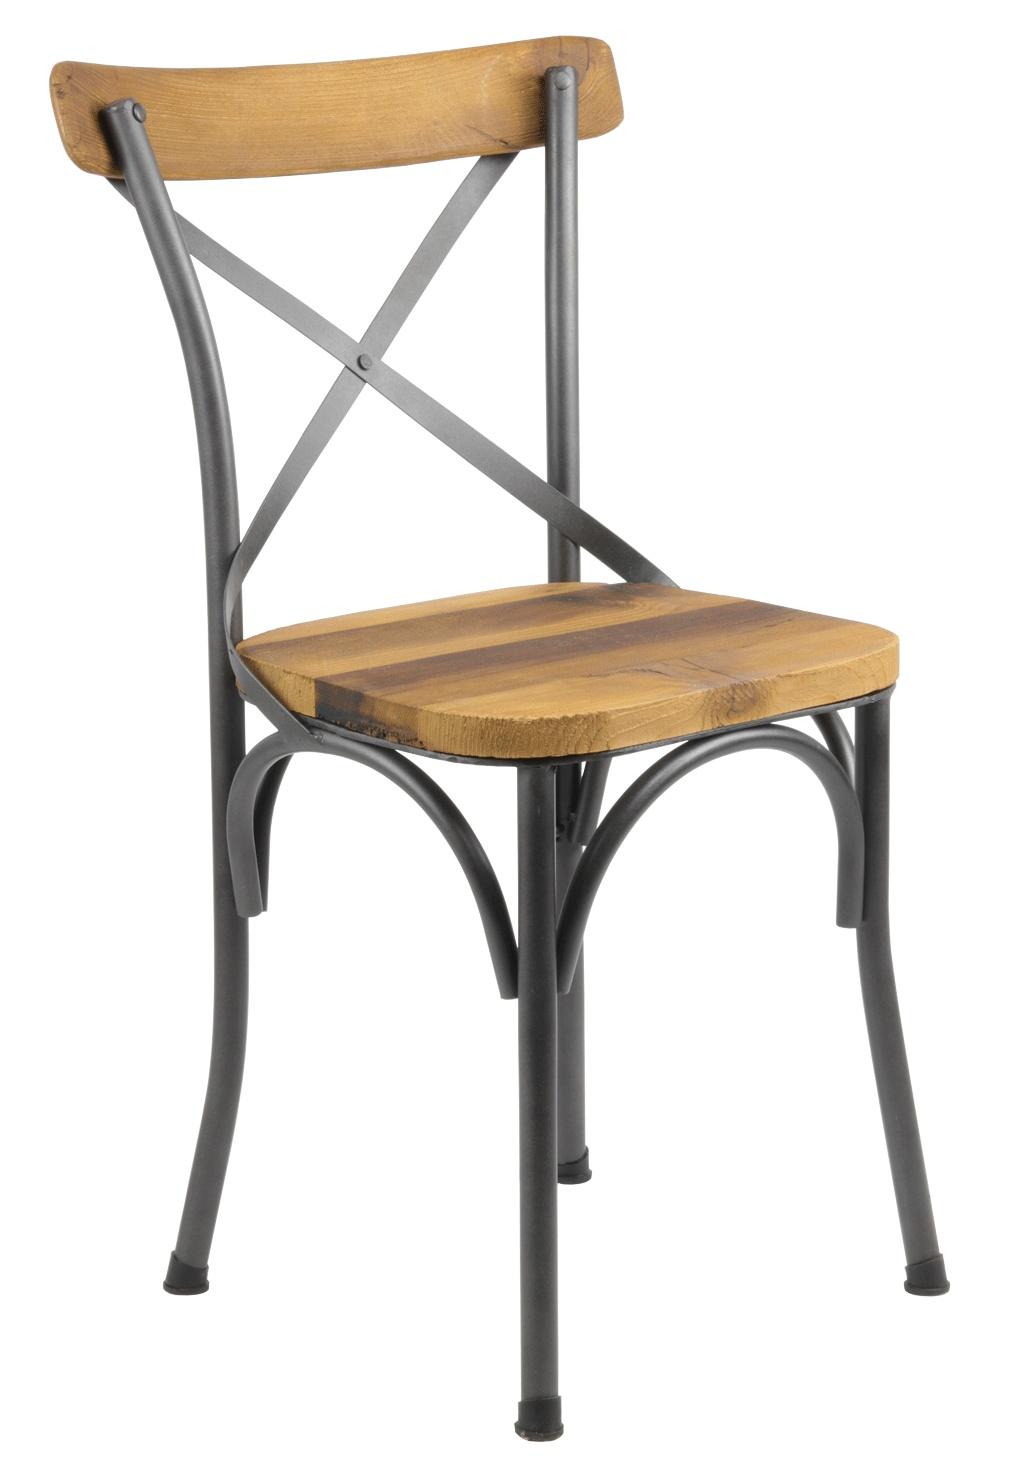 chaise bistrot industrielle bois et metal tradition